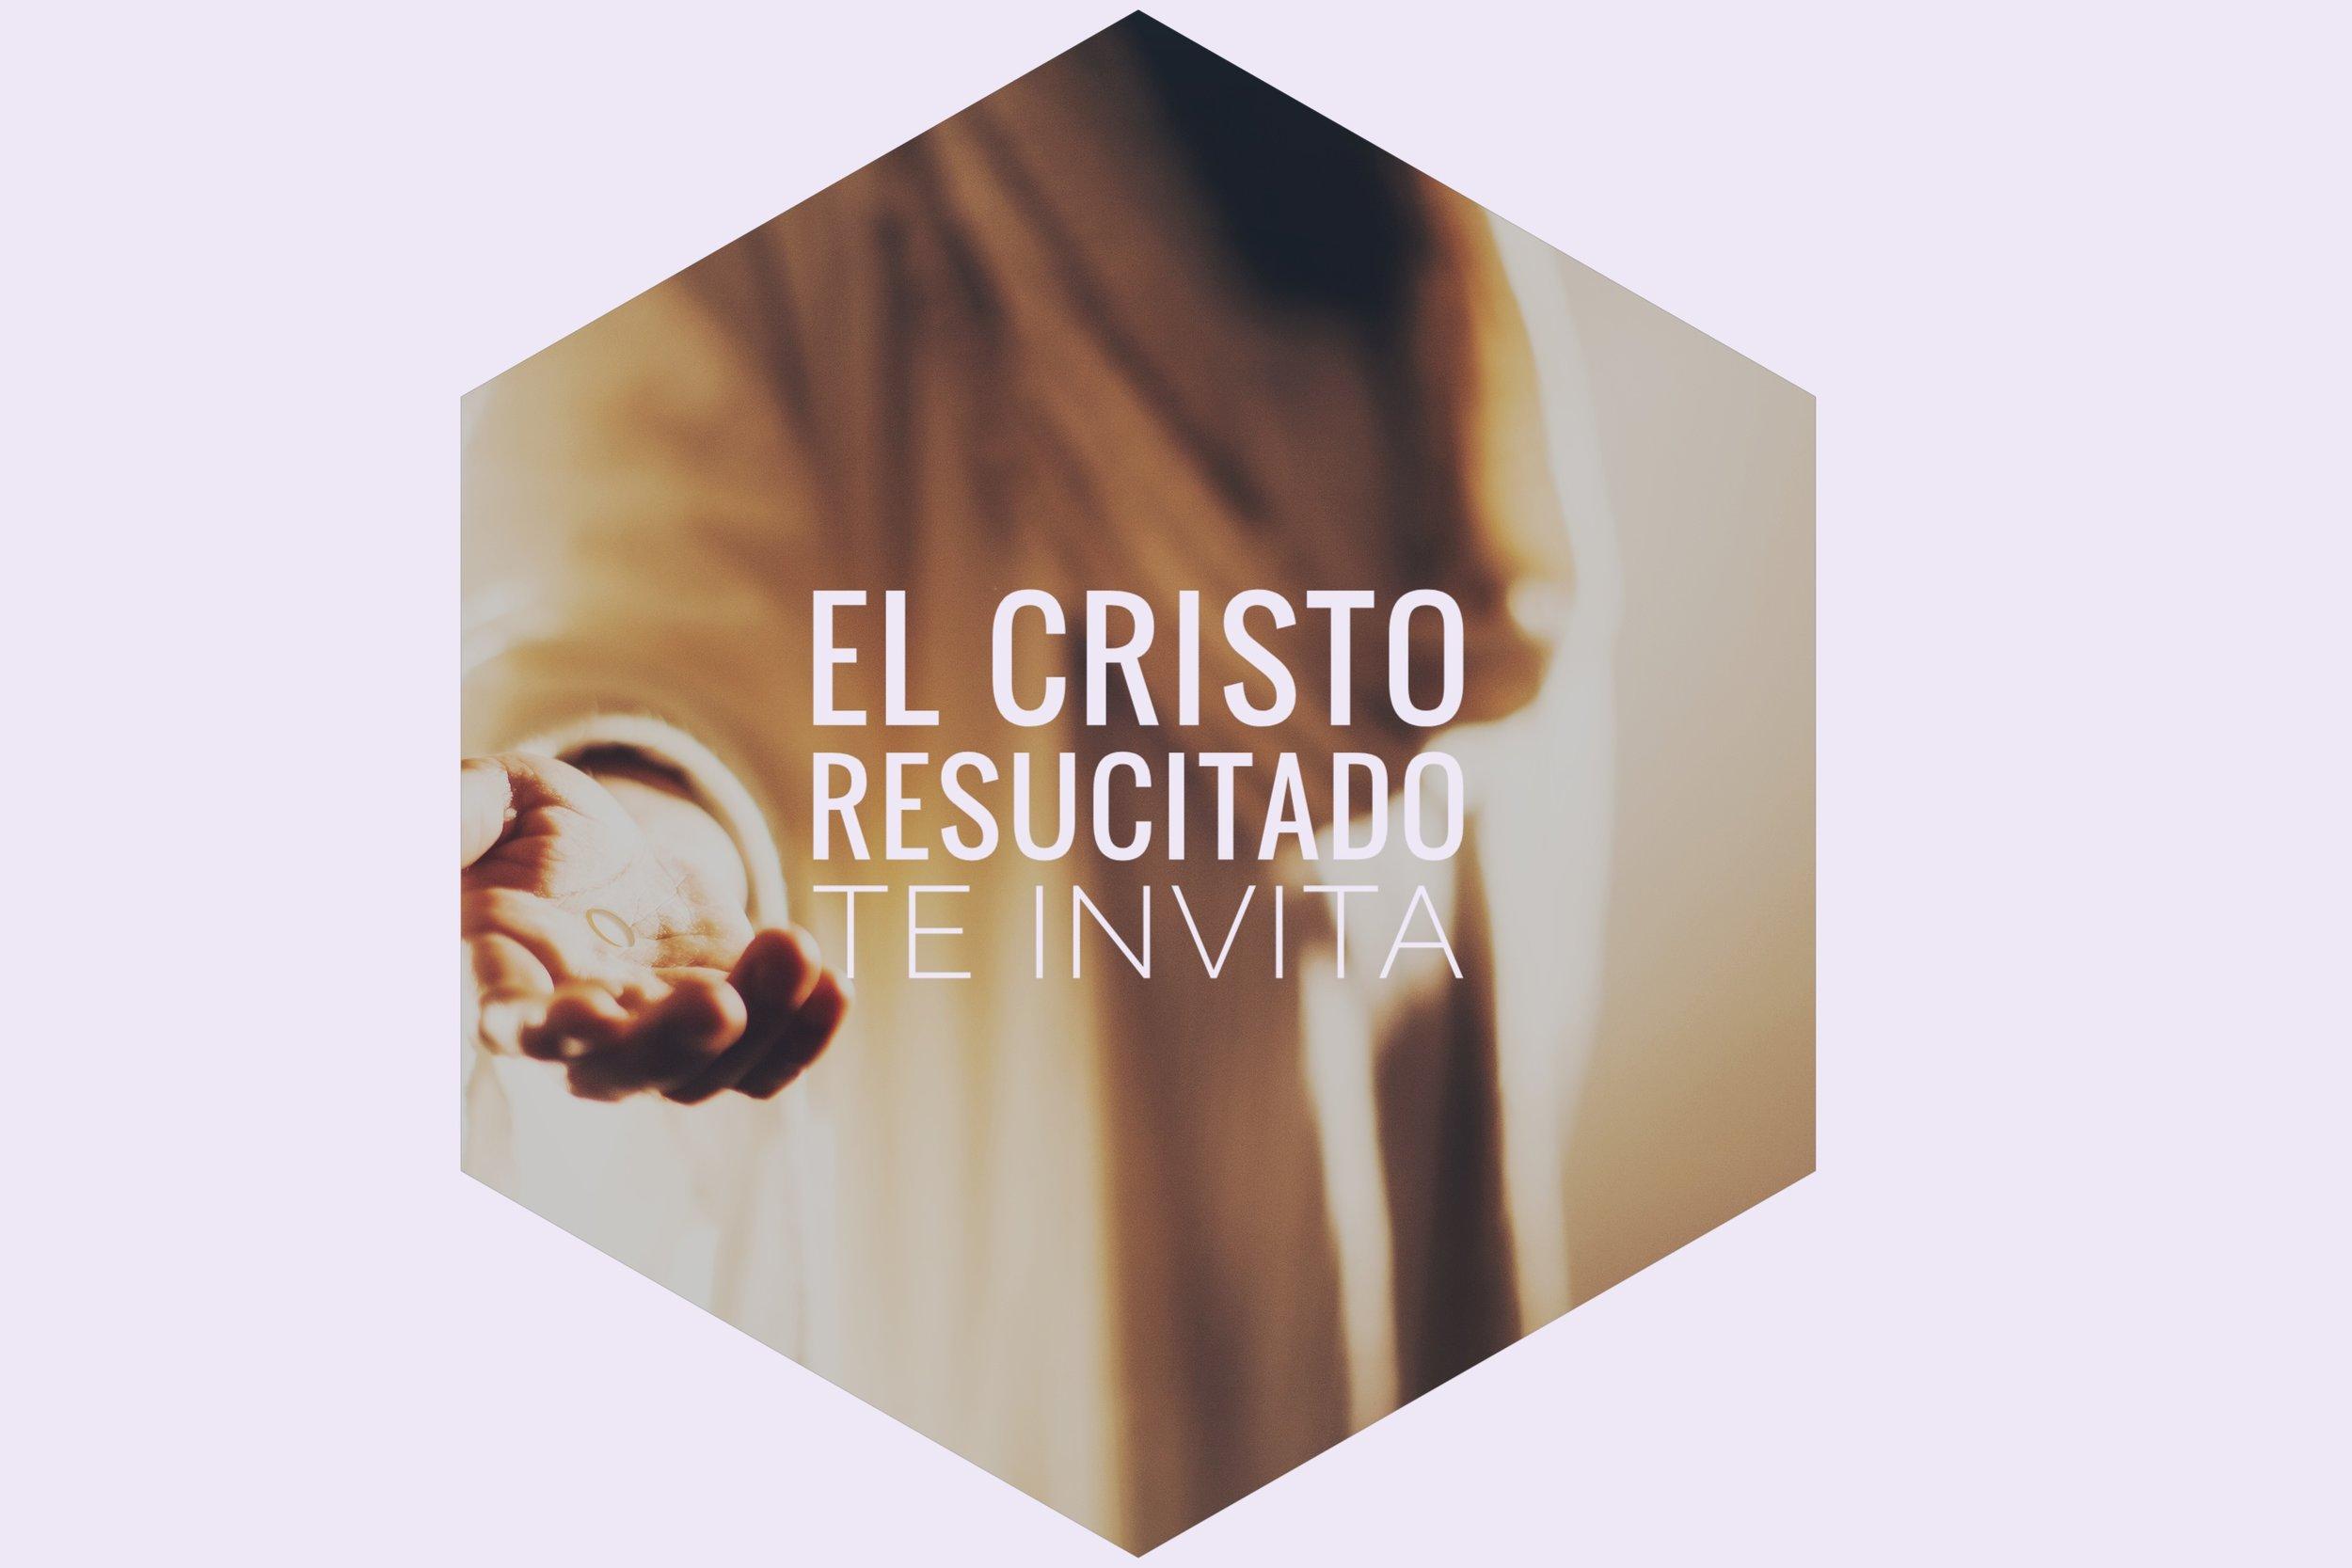 el Cristo resucitado te invita 05.05.19.jpeg